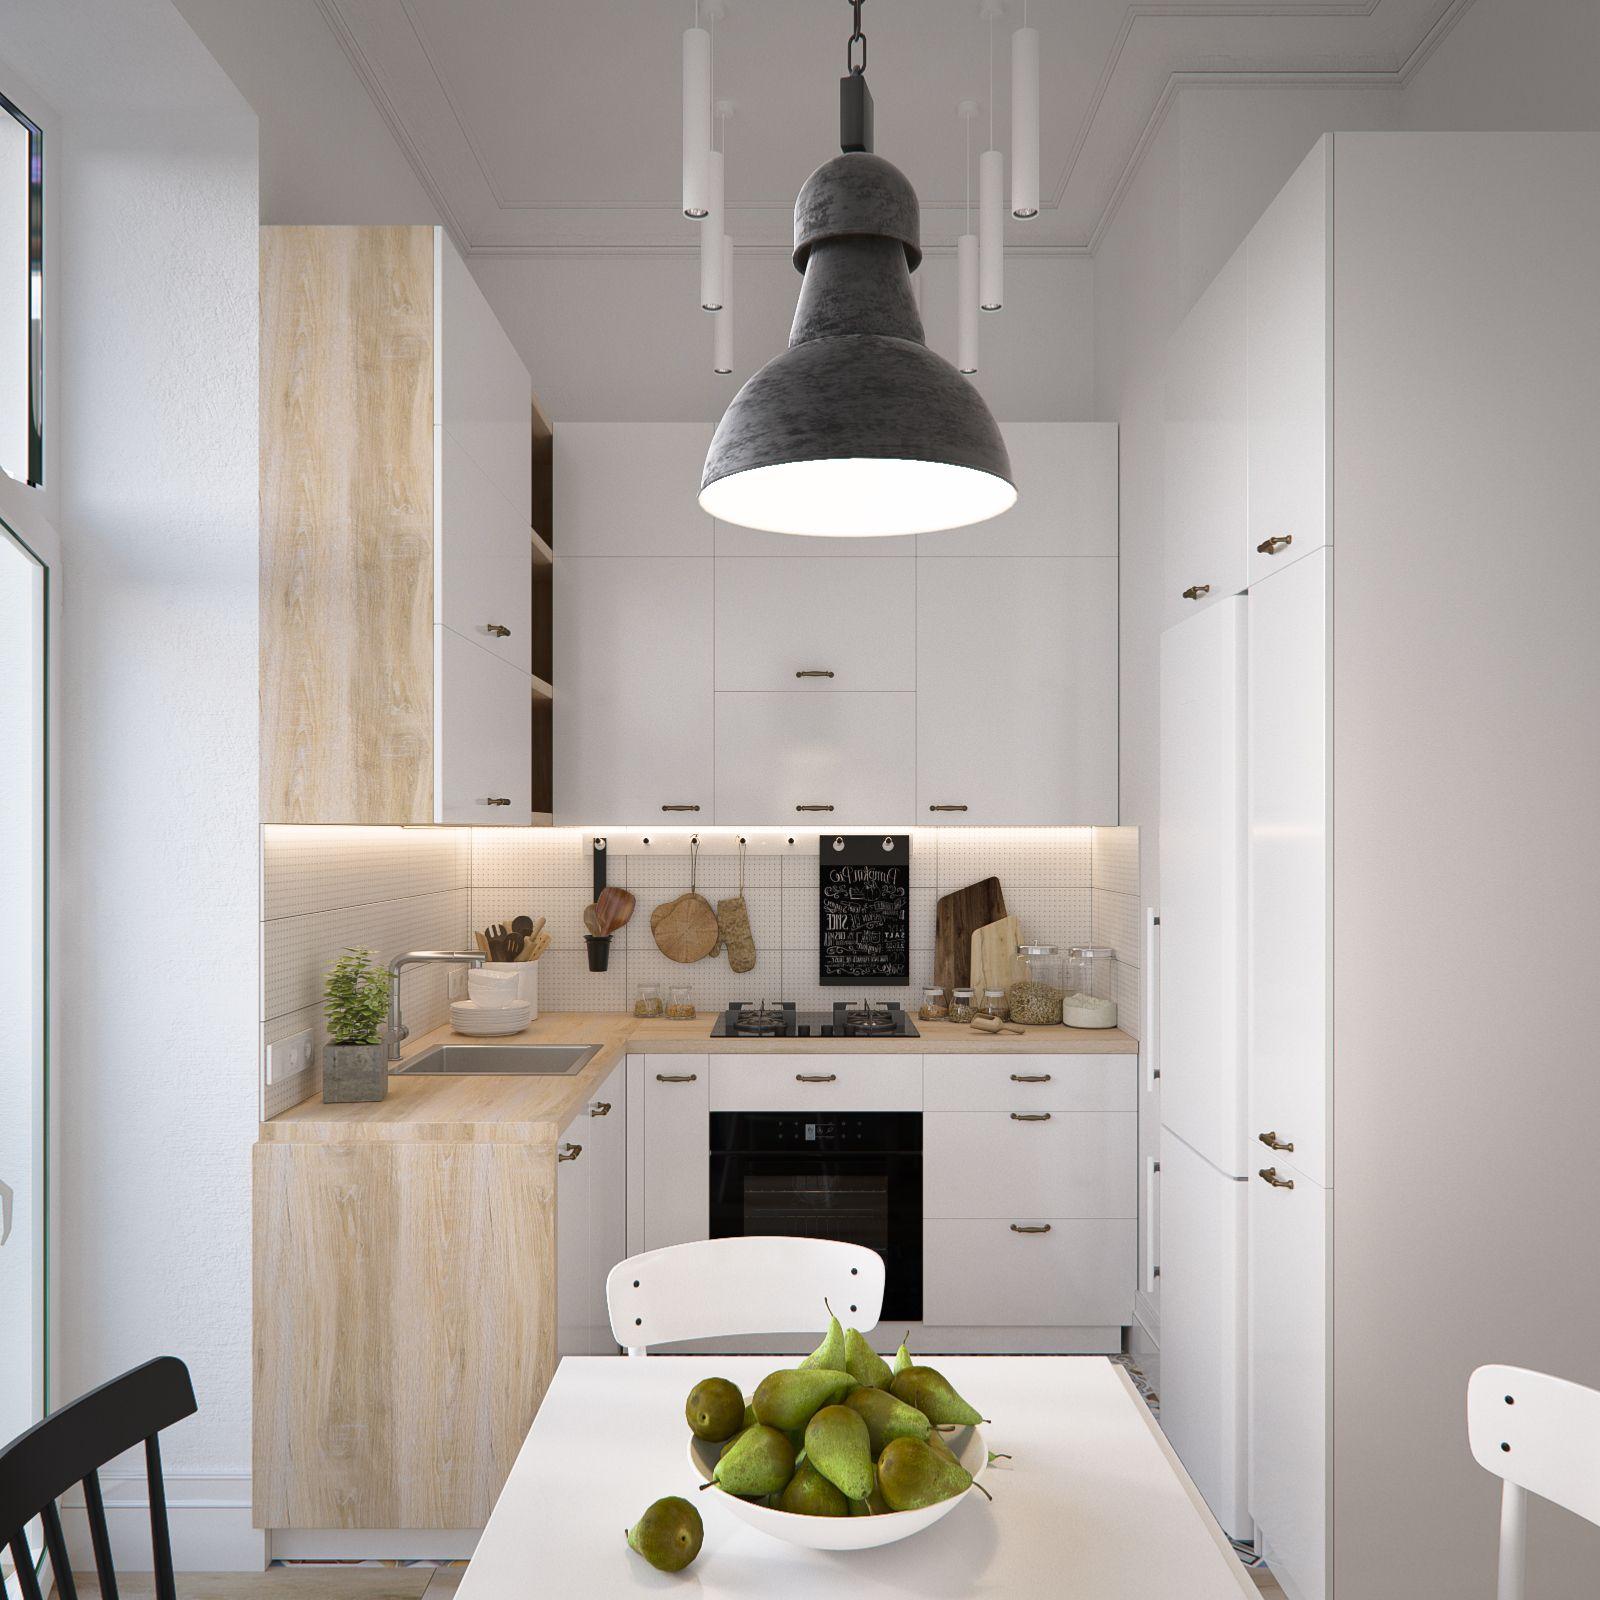 Modern Scandinavian Style Home Design For Young Families 2 Examples Scandinavian Style Home Kitchen Remodel Small Kitchen Decor